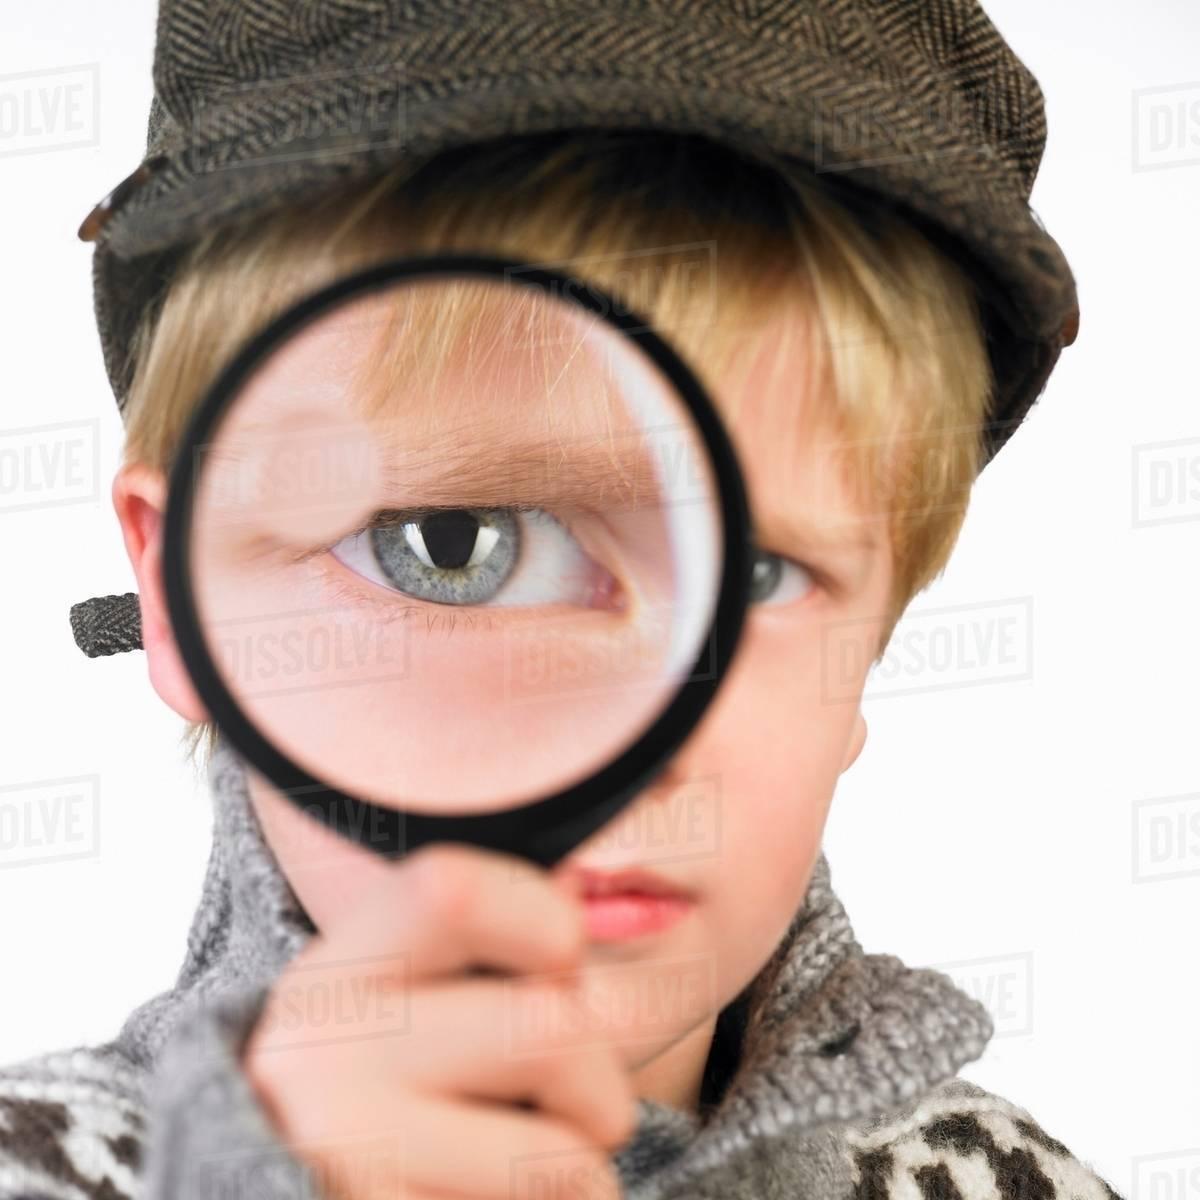 Boy's eye through a magnifying glass Royalty-free stock photo